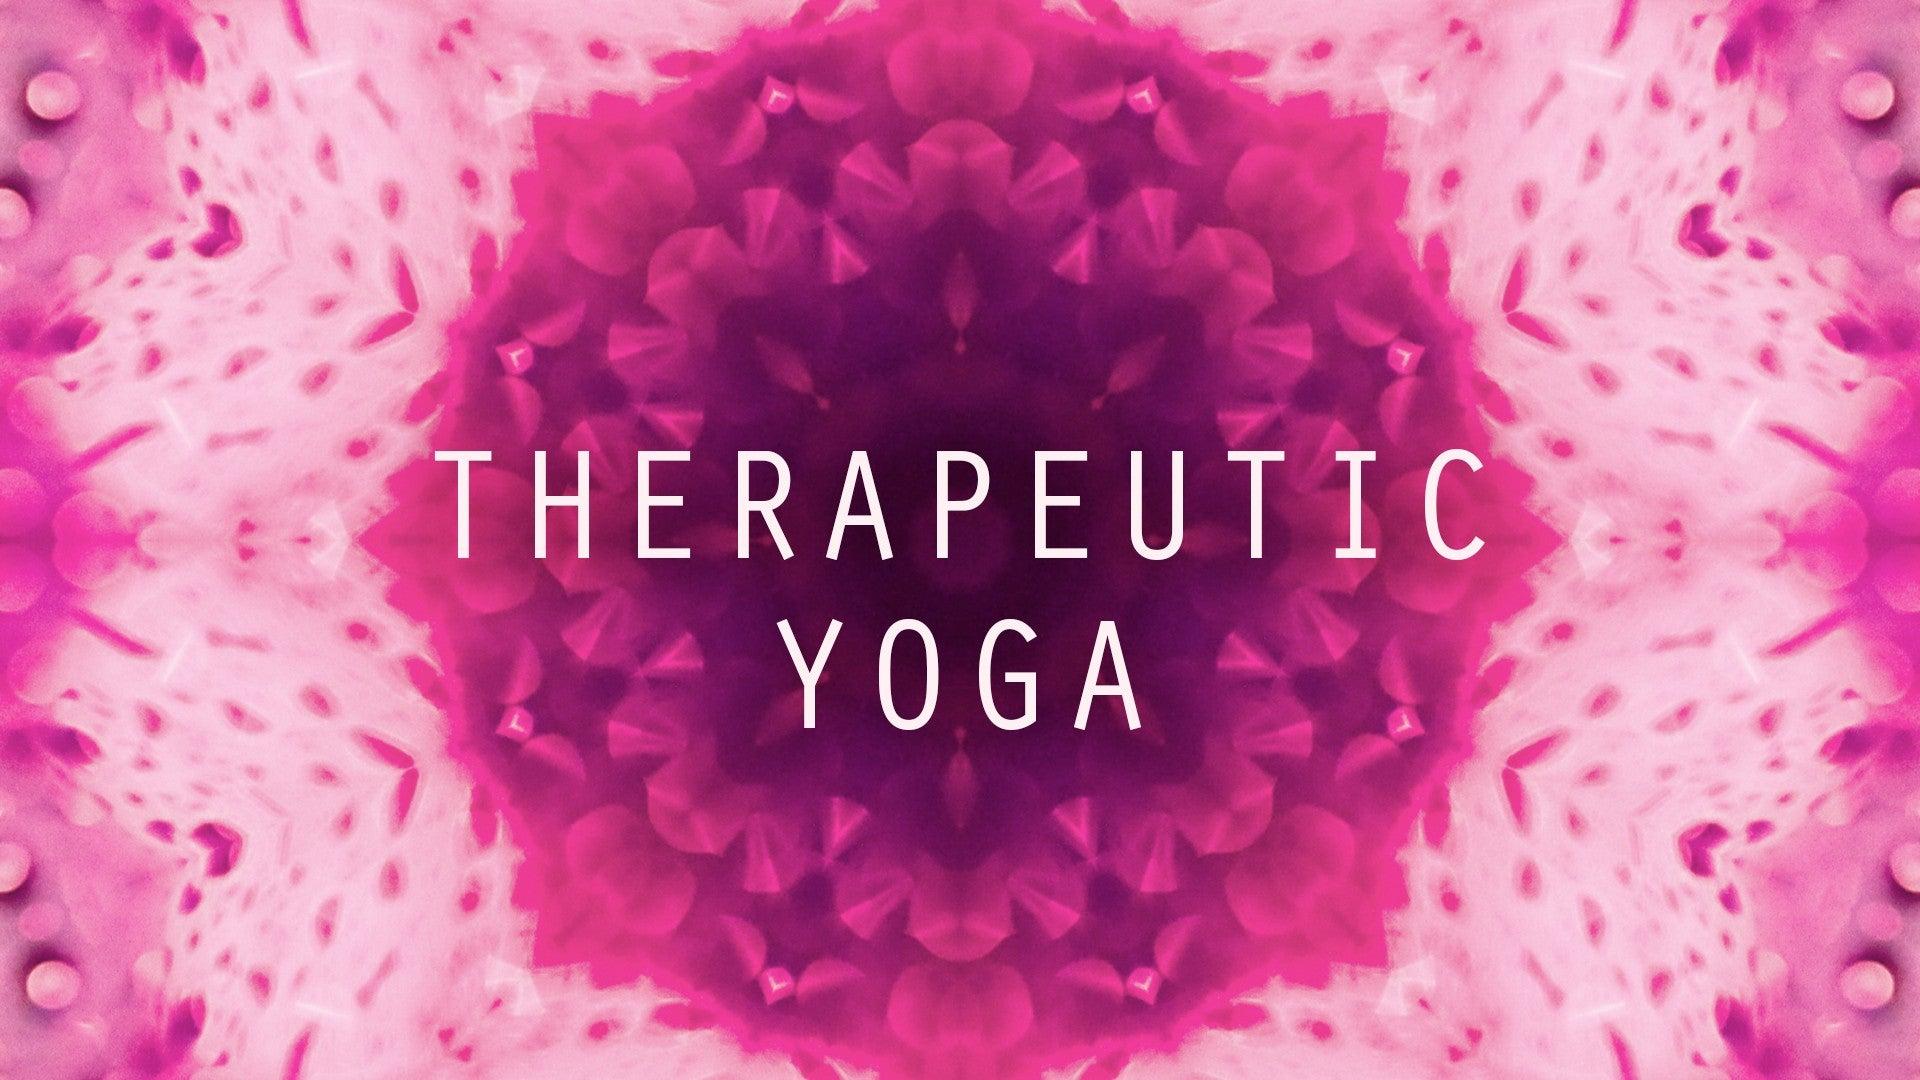 Full Finaltherapeuticyoga